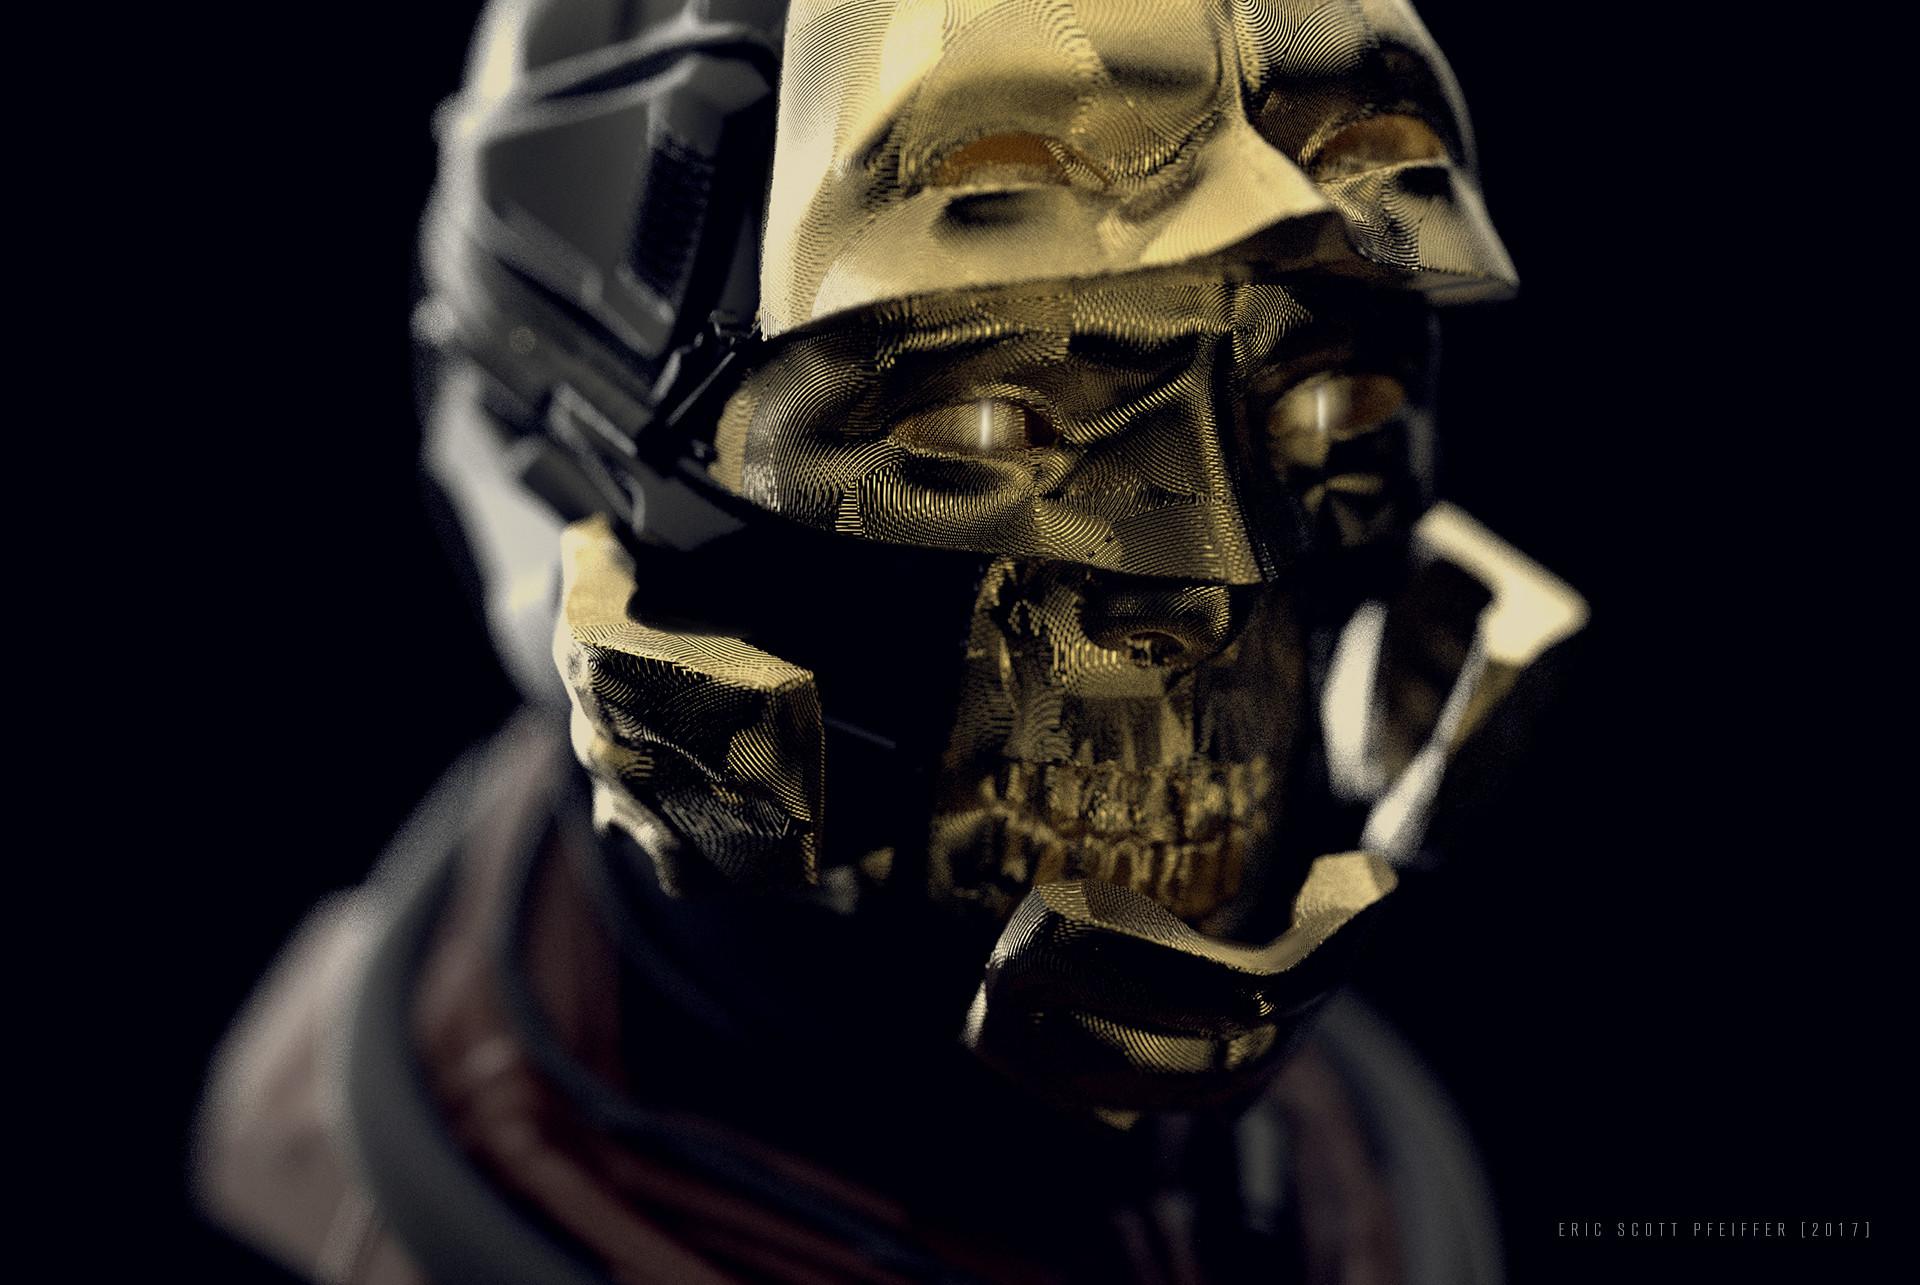 Eric pfeiffer hiddenagendas helmet closeup